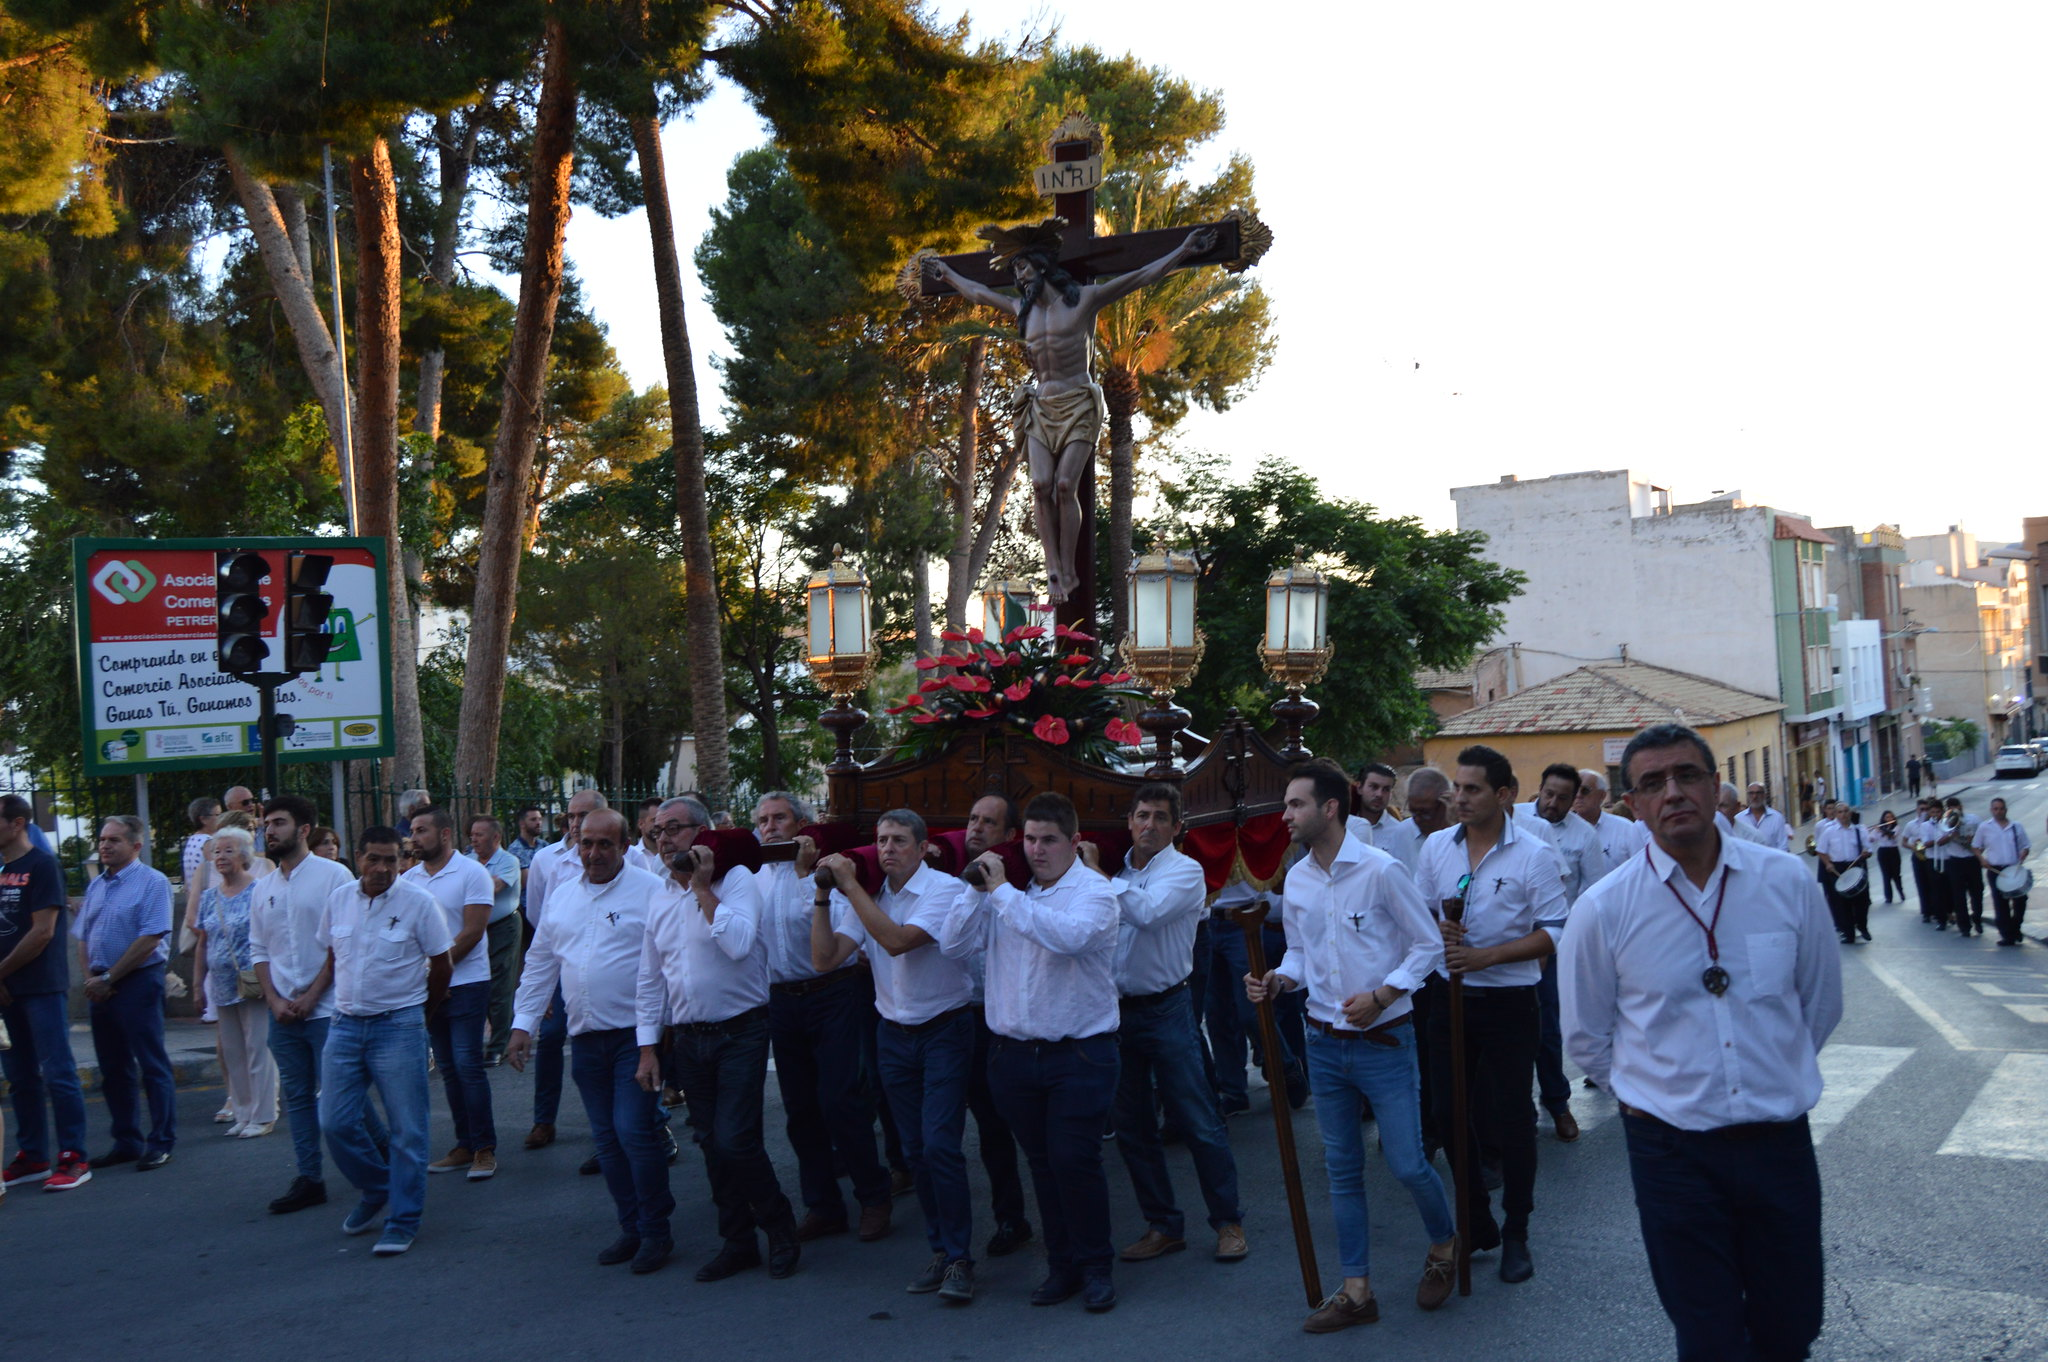 (2017-07-02) Procesión de subida (Adrián Romero Montesinos) (63)